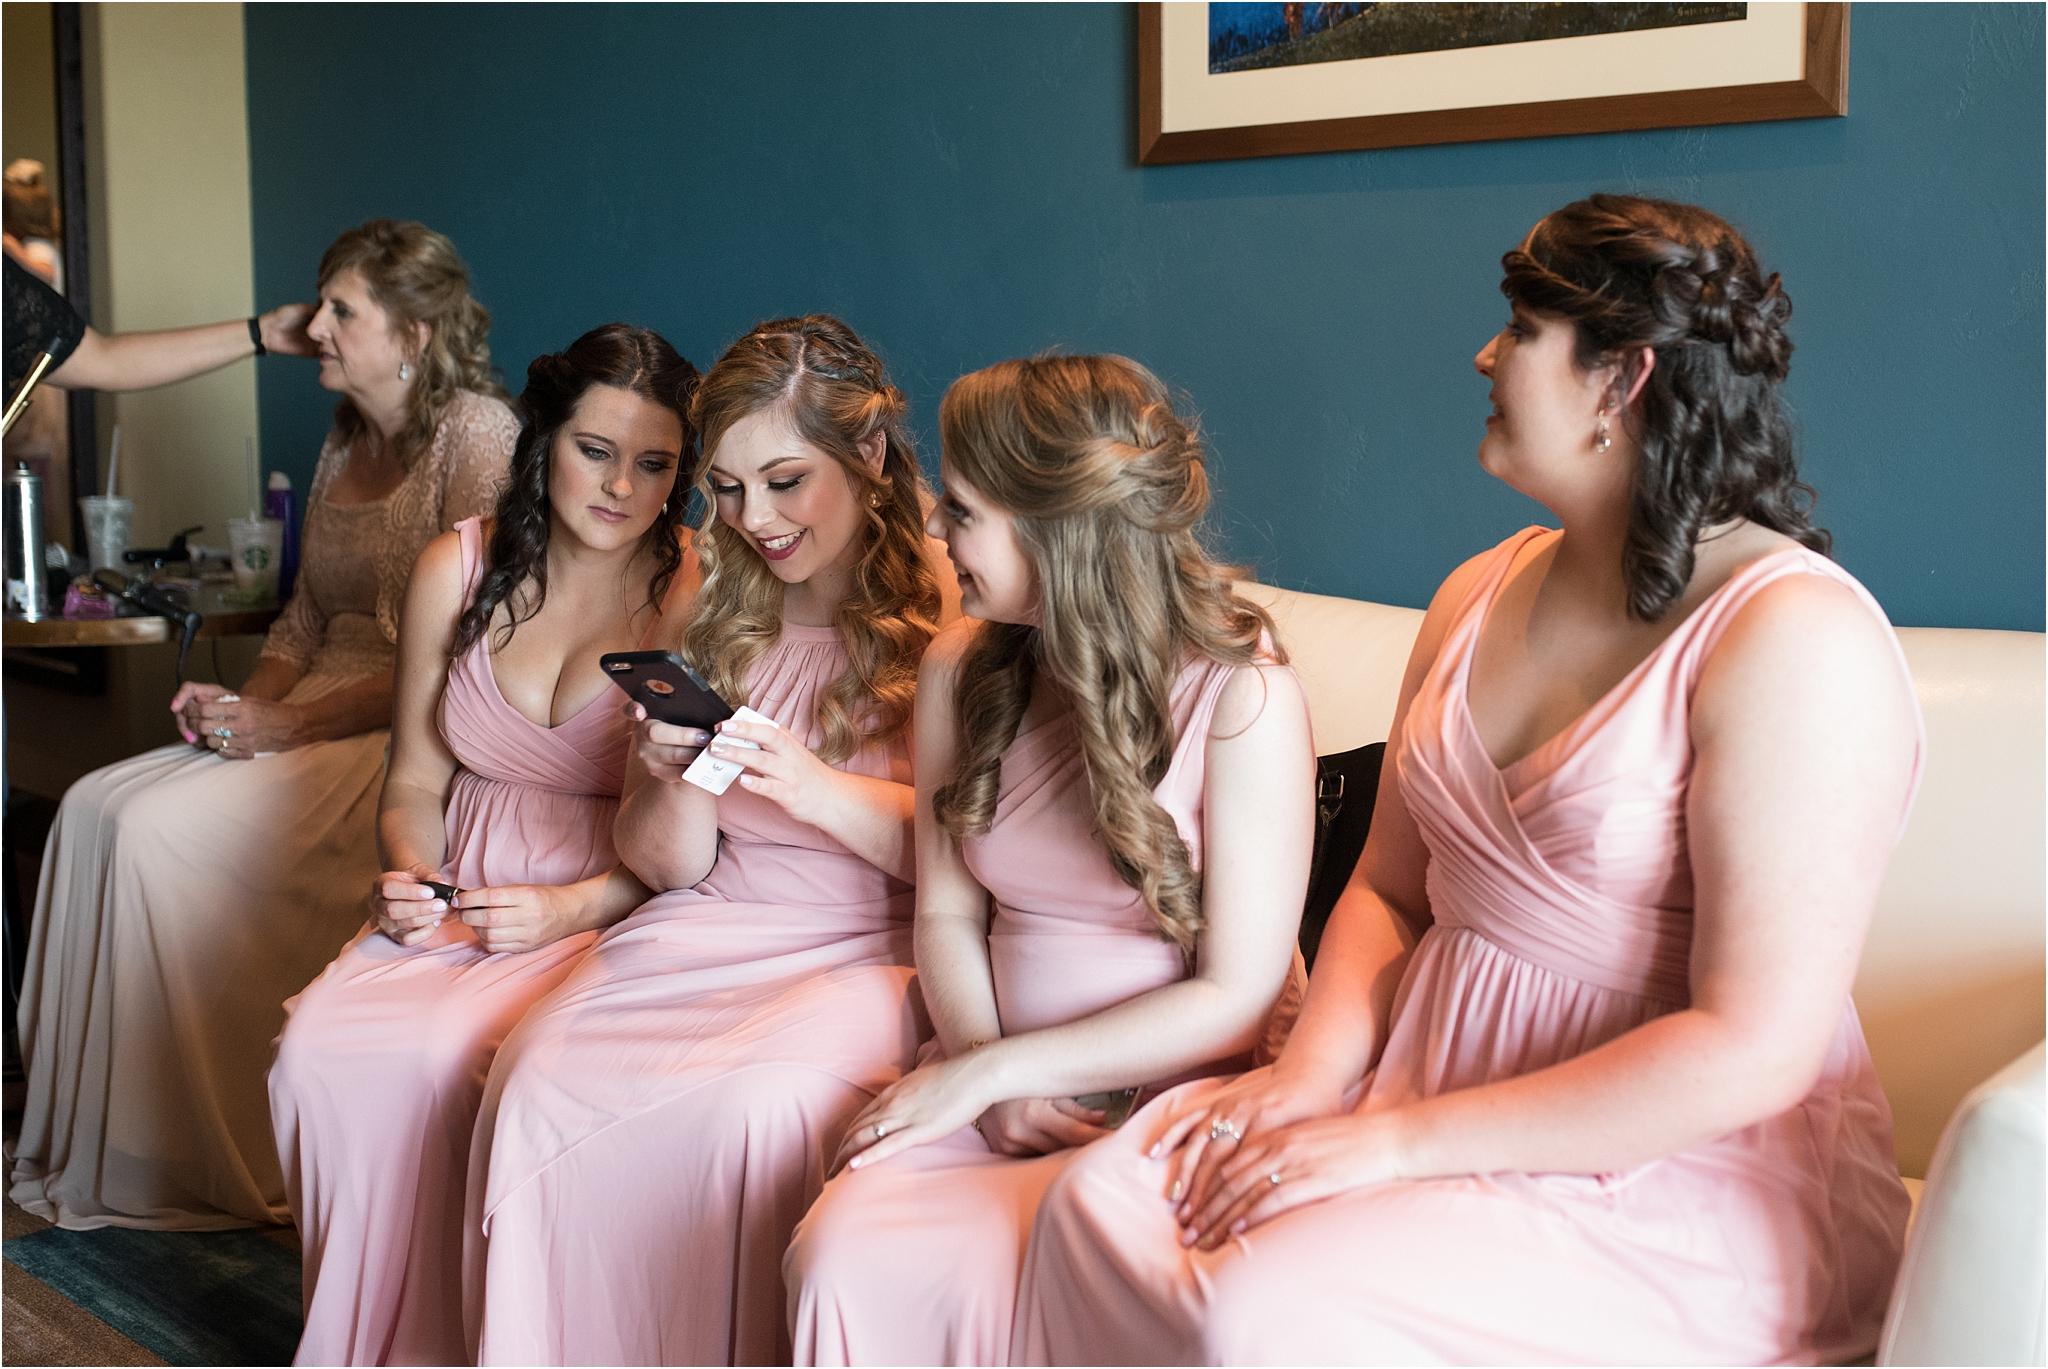 kayla kitts photography - isleta casino wedding - albuquerque wedding photographer - new mexico wedding photographer - de novo pastoral_0006.jpg